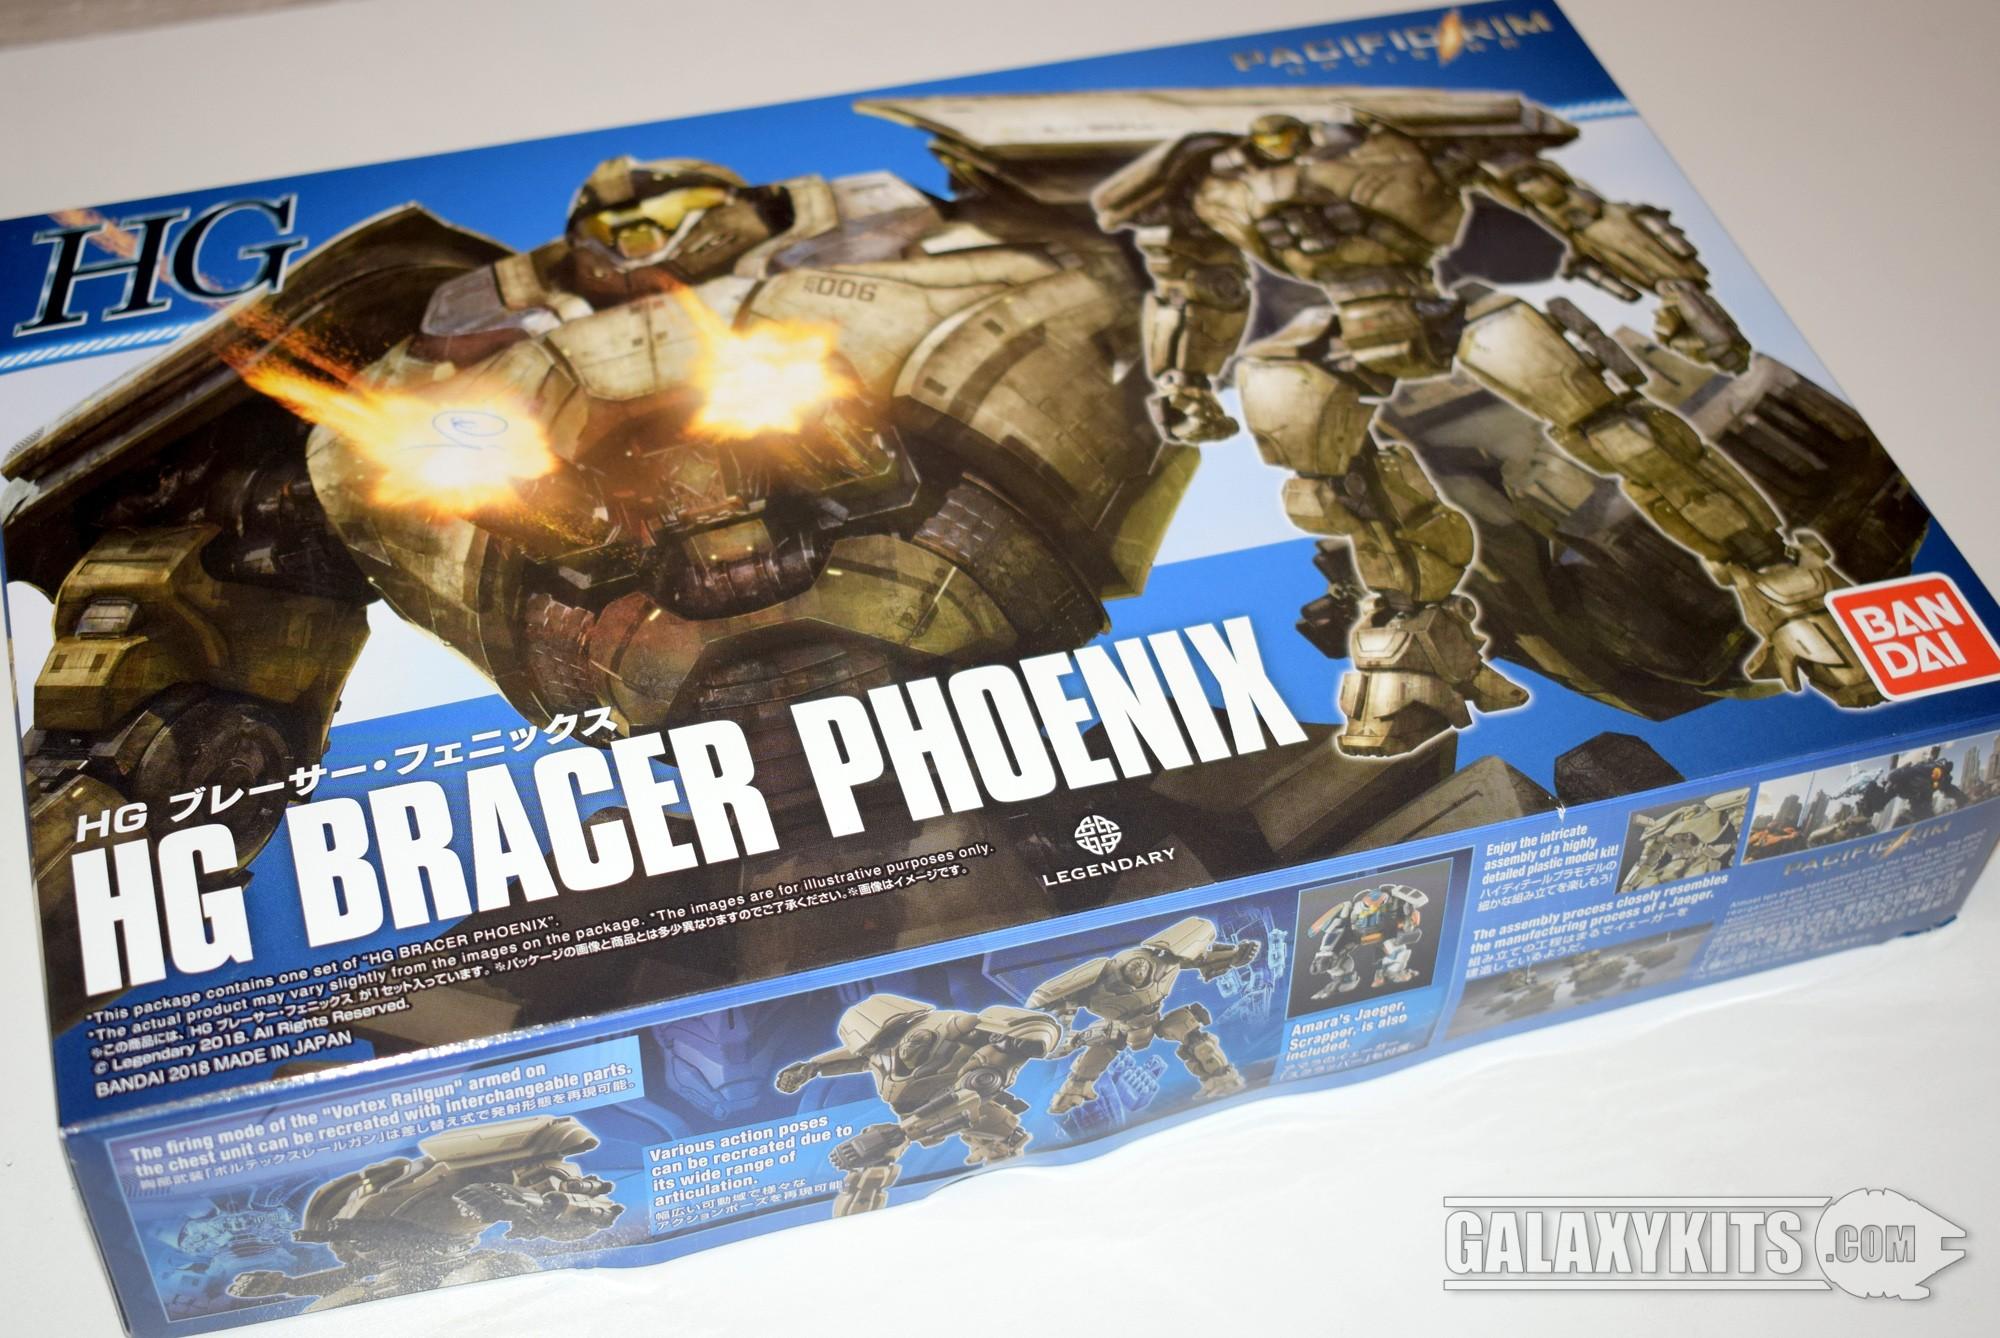 HG Bracer Phoenix – Pacific Rim: Uprising / 1:144 / Bandai